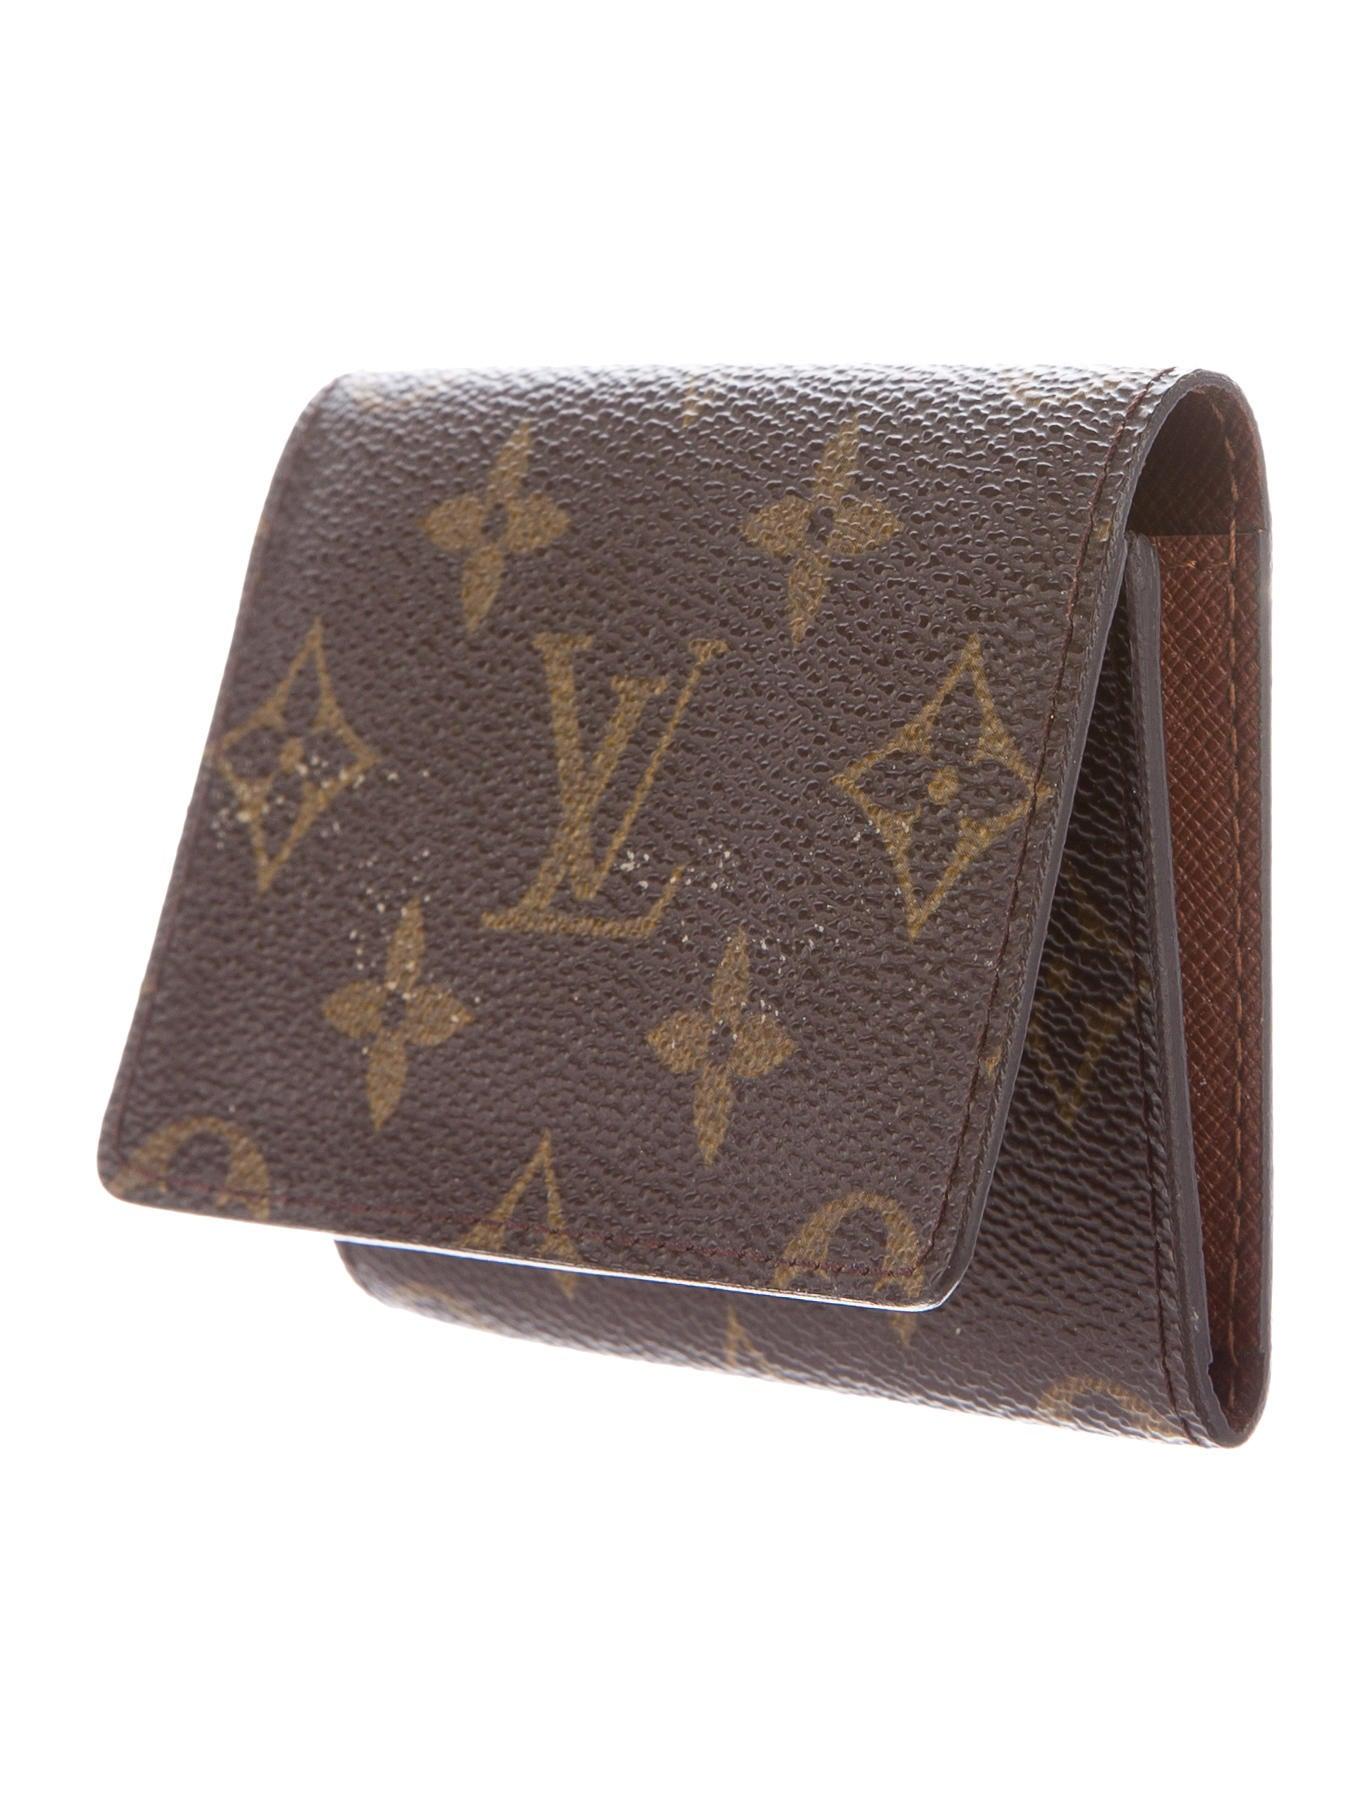 Louis vuitton monogram business card holder accessories lou90019 monogram business card holder colourmoves Images